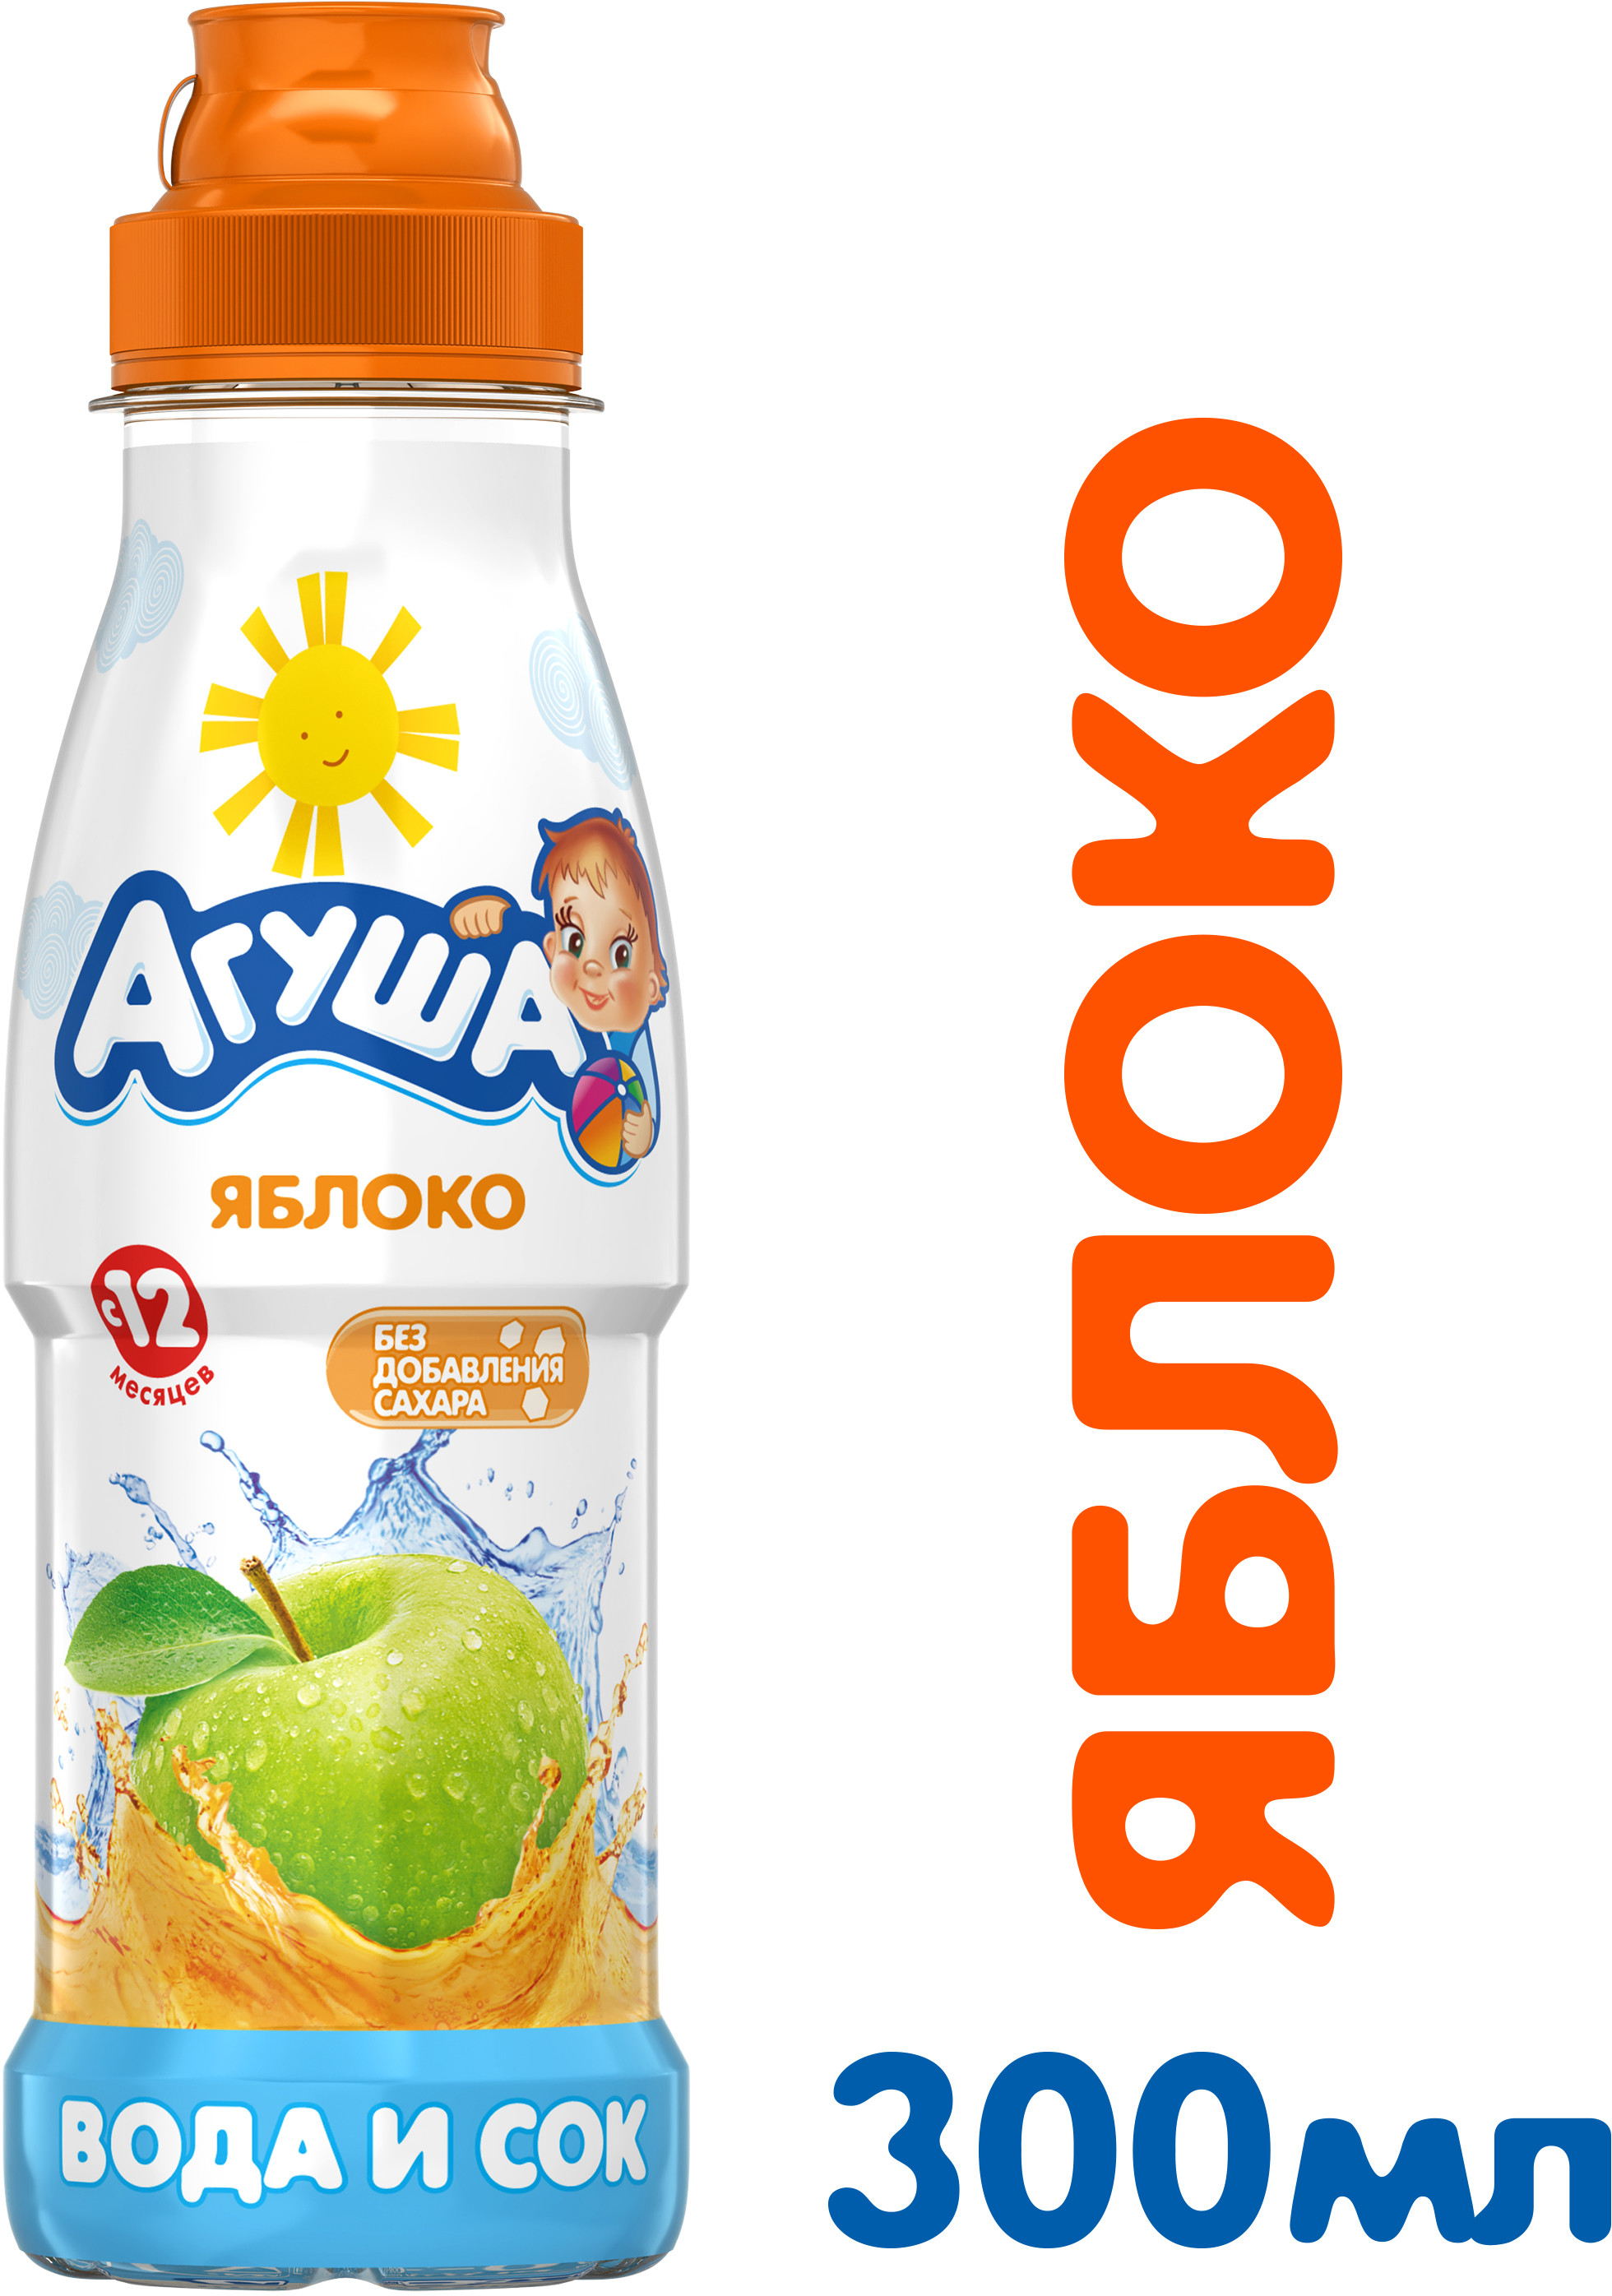 Напиток Вимм-Билль-Данн Агуша «Вода и сок» Яблоко с 12 мес. 300 мл напиток сухой mr dominant amino space концентрат яблоко 300 г